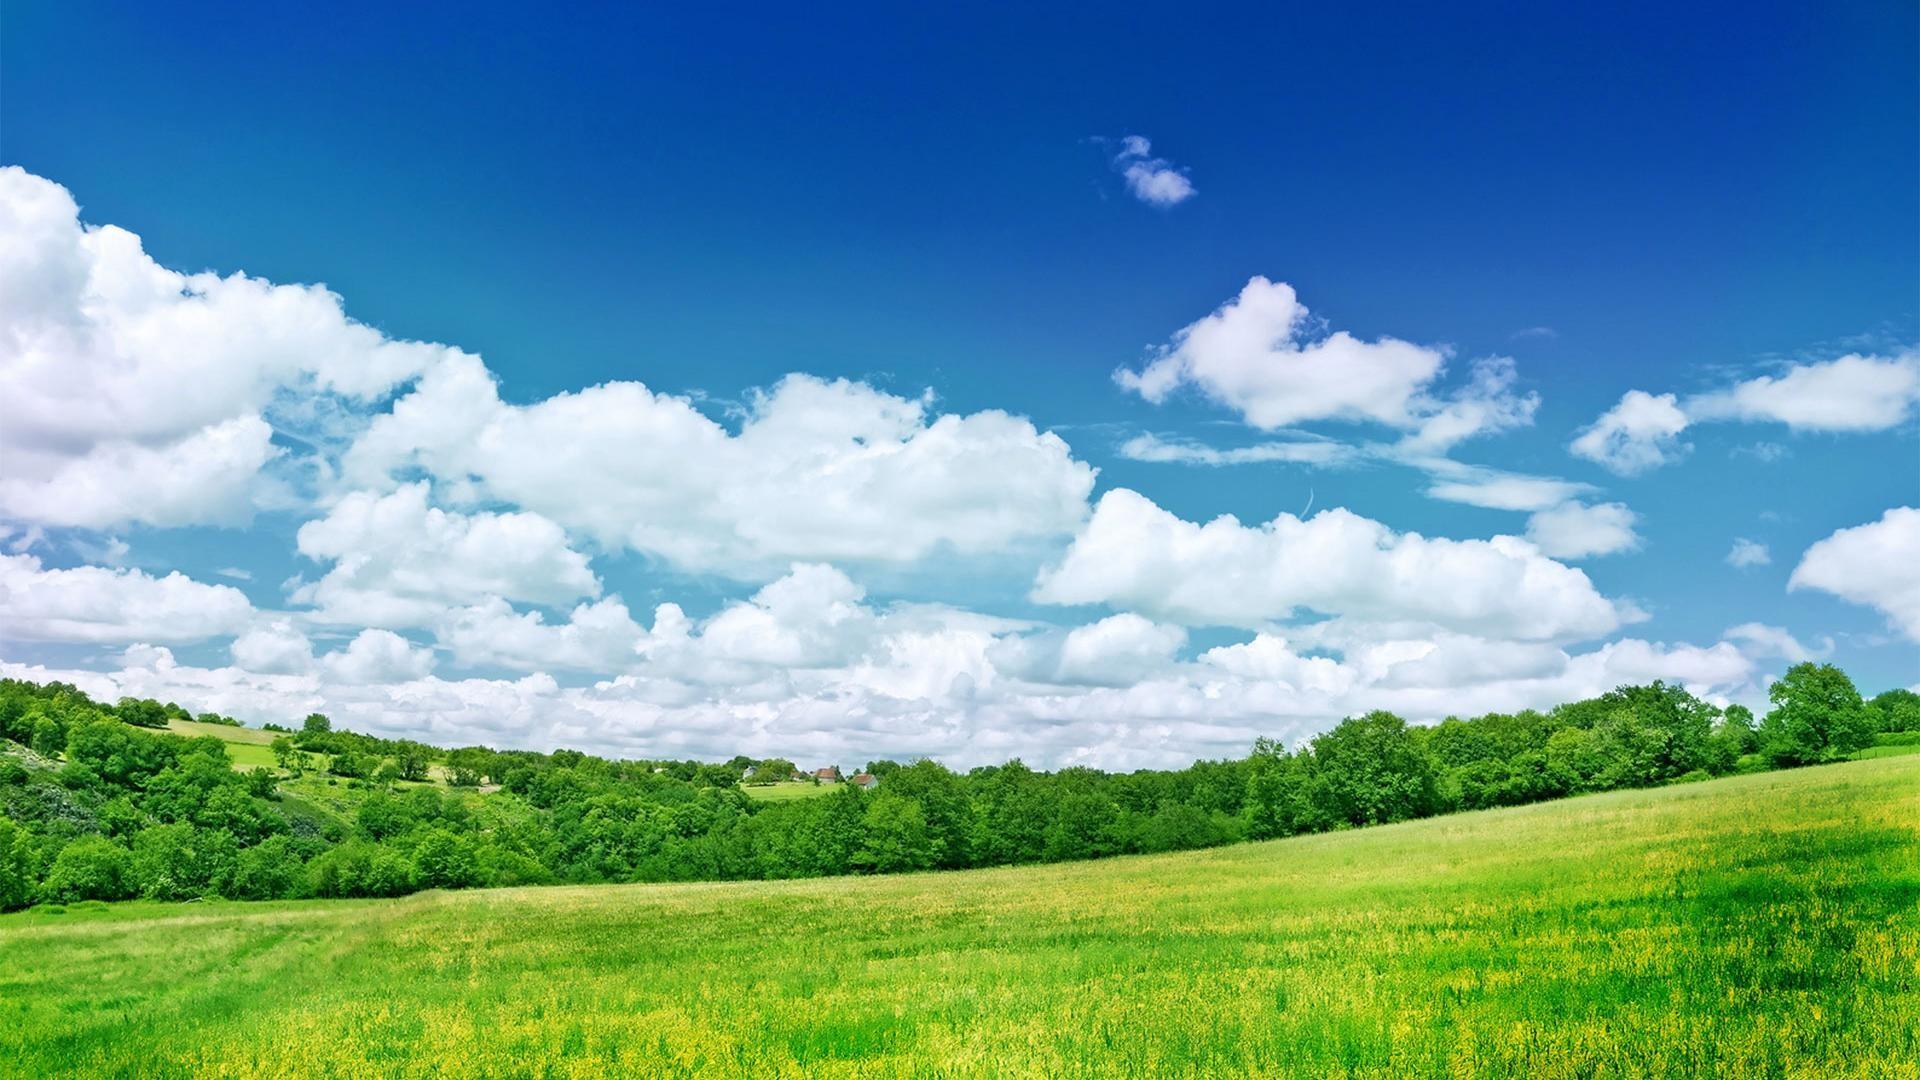 hd fresh summer grassland scenery backgrounds wide  wallpapers:1280×800,1440×900,1680×1050 –